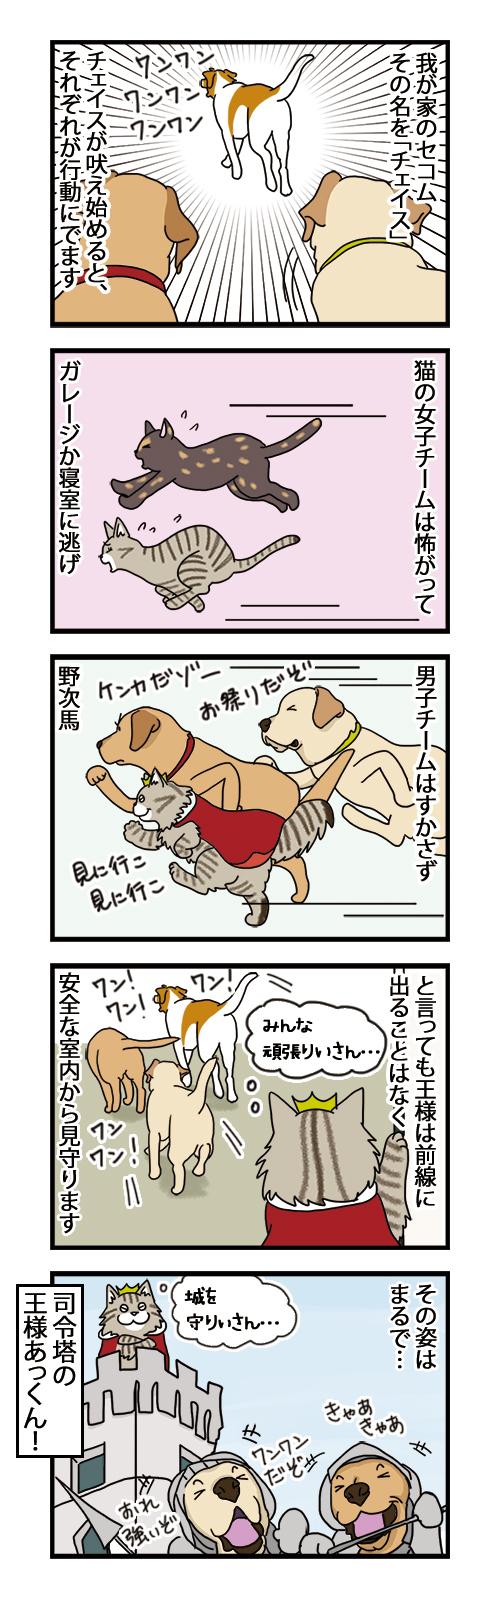 20072021_dogcomic.jpg